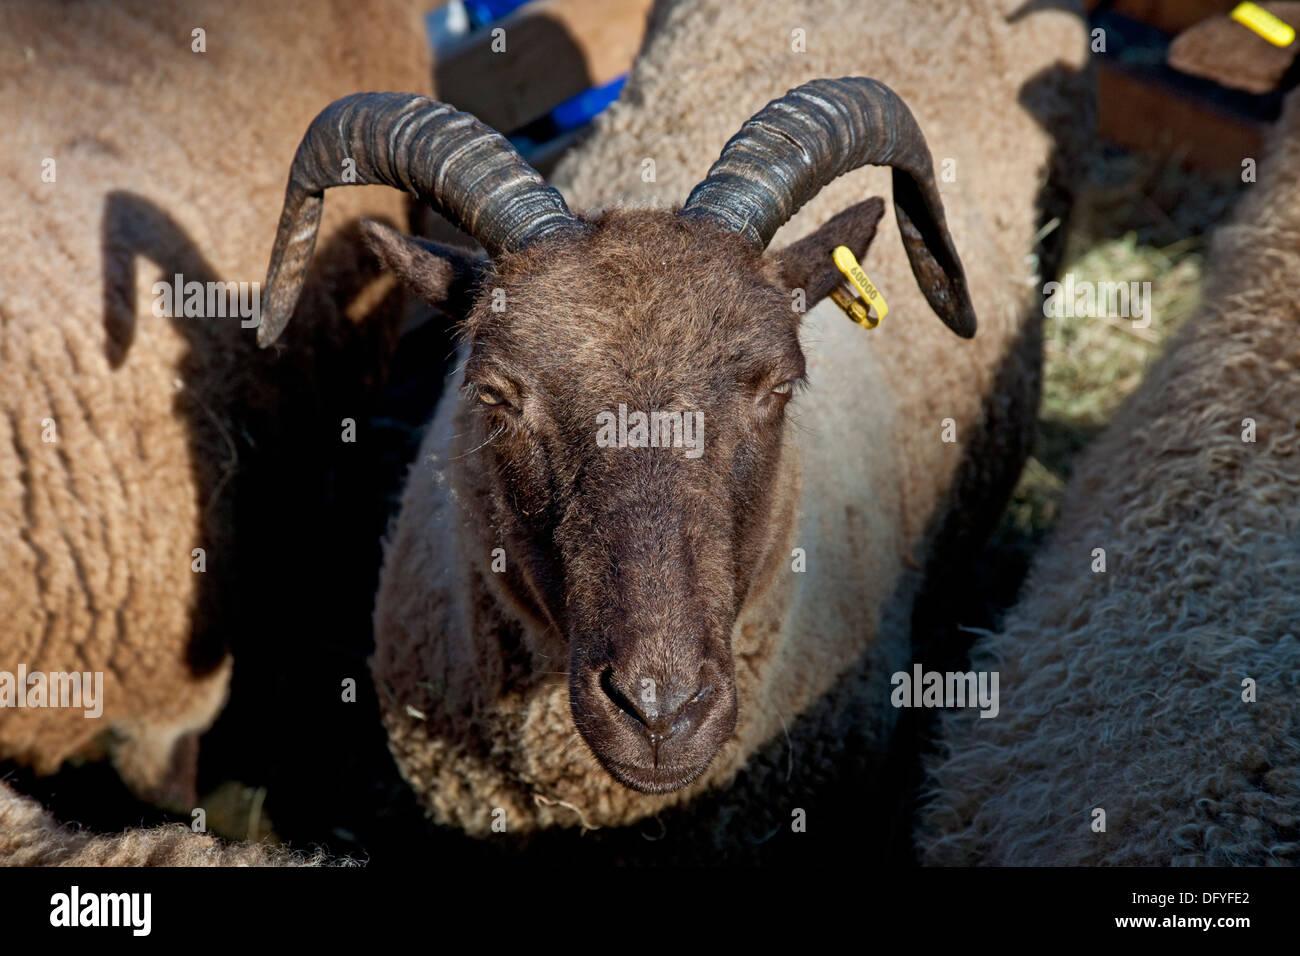 Close up of a Manx Loaghtan Sheep - Stock Image